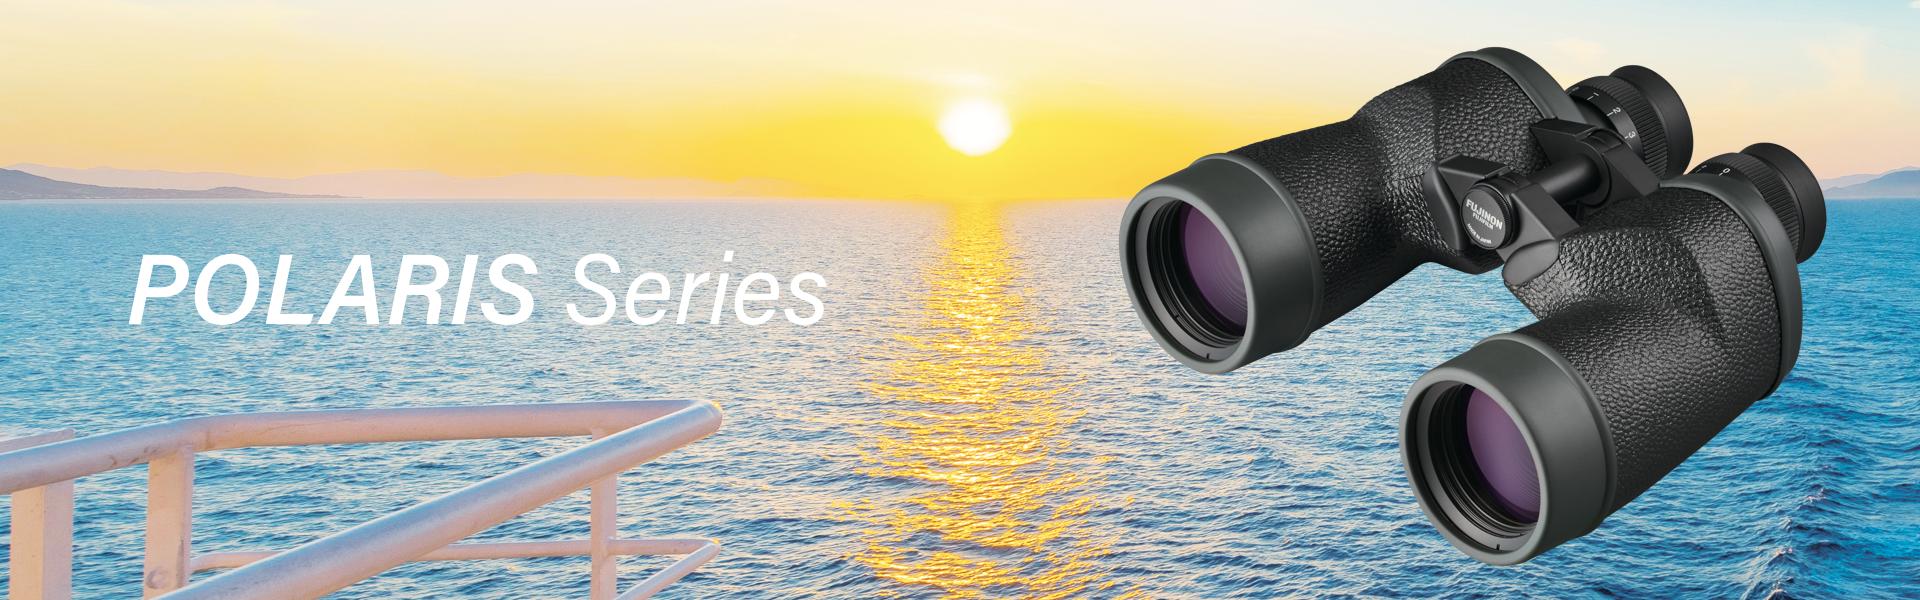 Polaris Series binocular over ocean at sunset